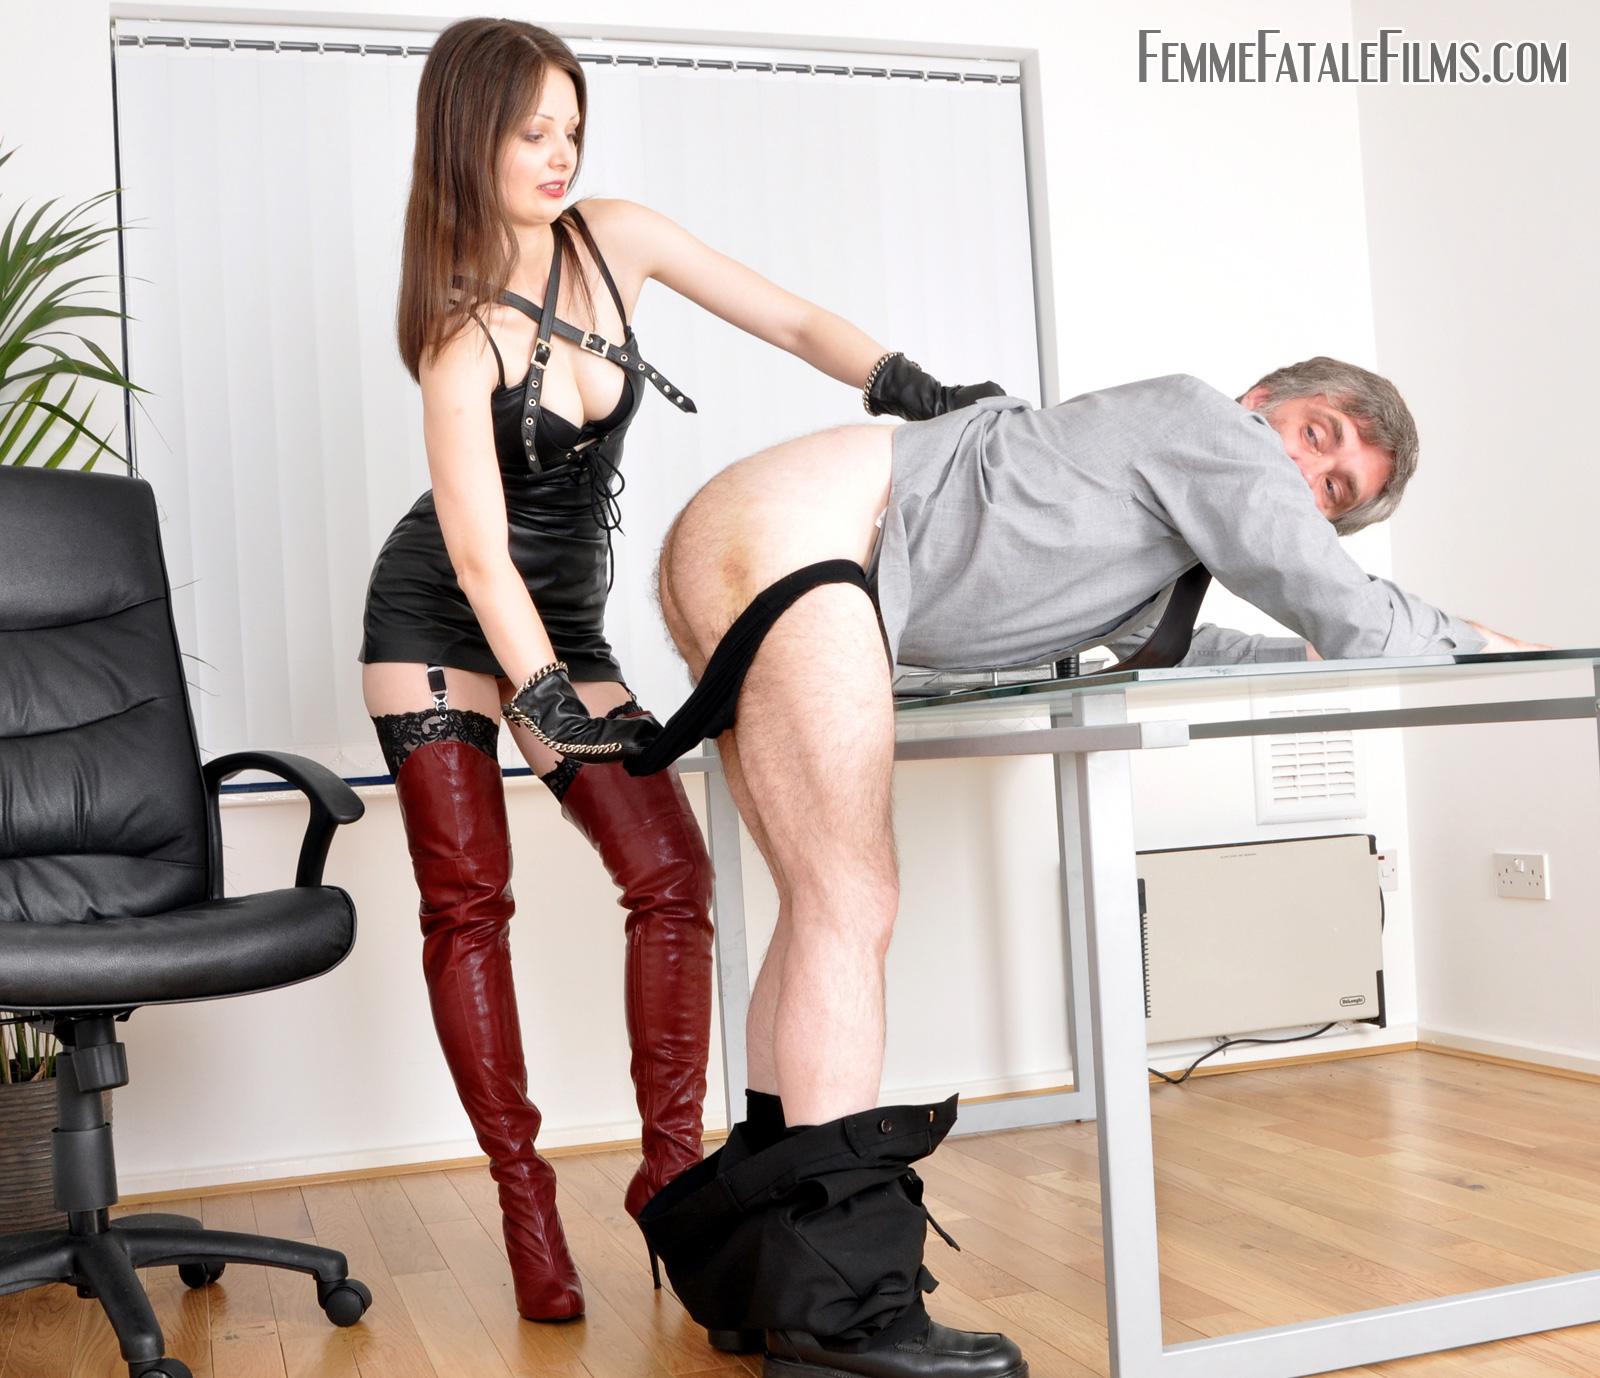 Femme Fatale Films | HD Femdom BDSM Domination Videos